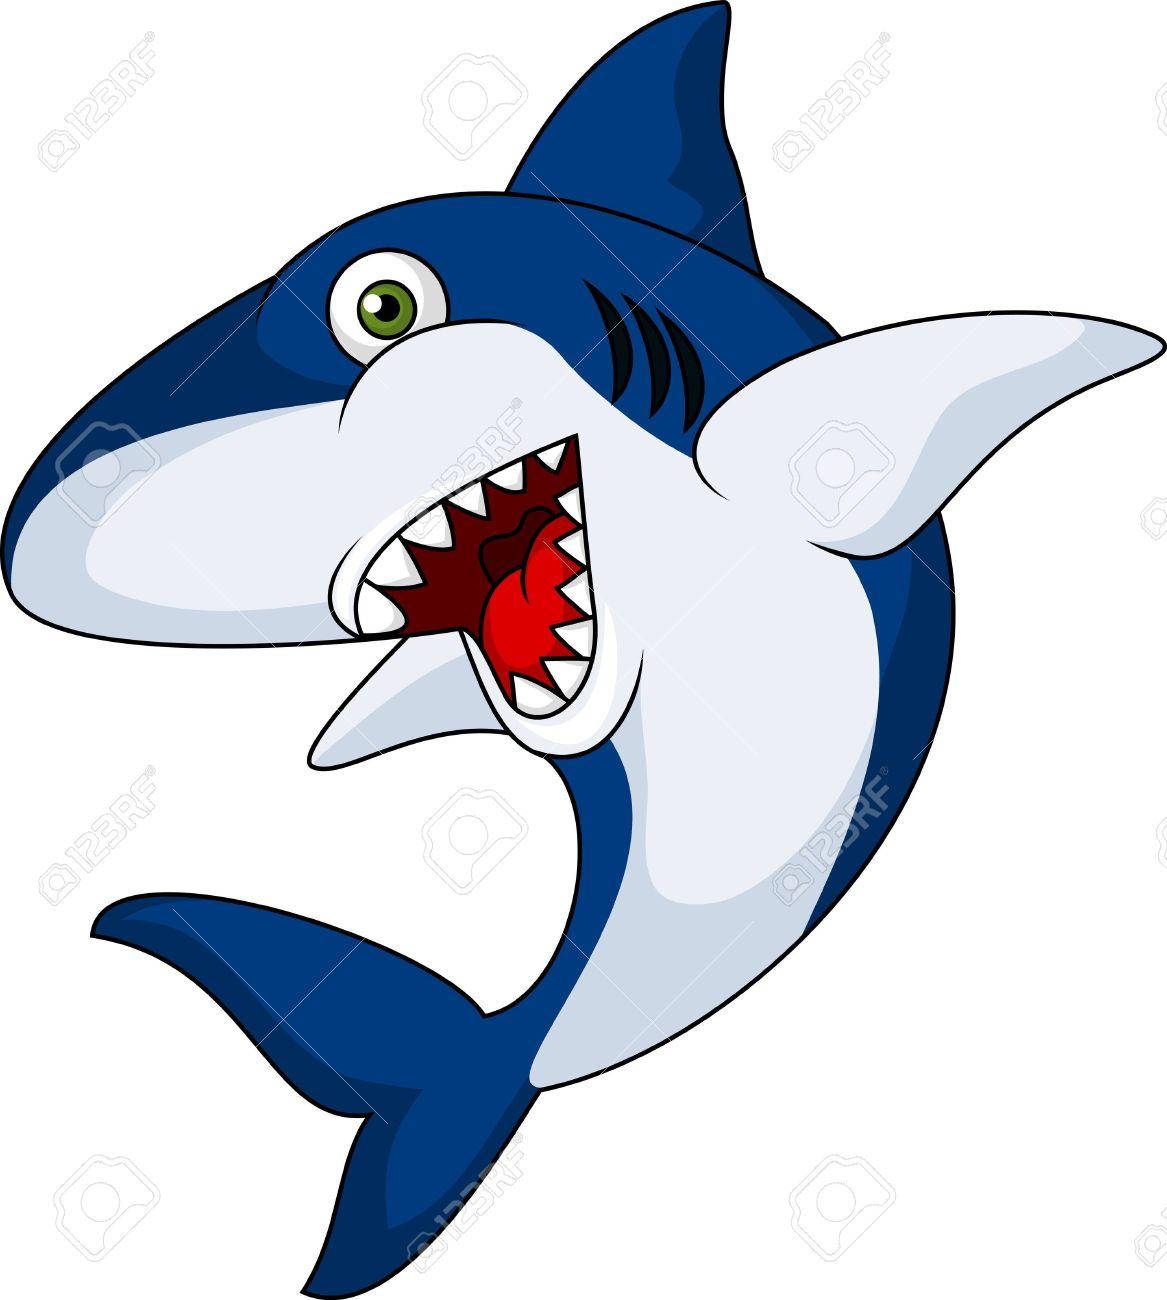 1167x1300 Smiling Shark Cartoon Royalty Free Cliparts, Vectors, And Stock